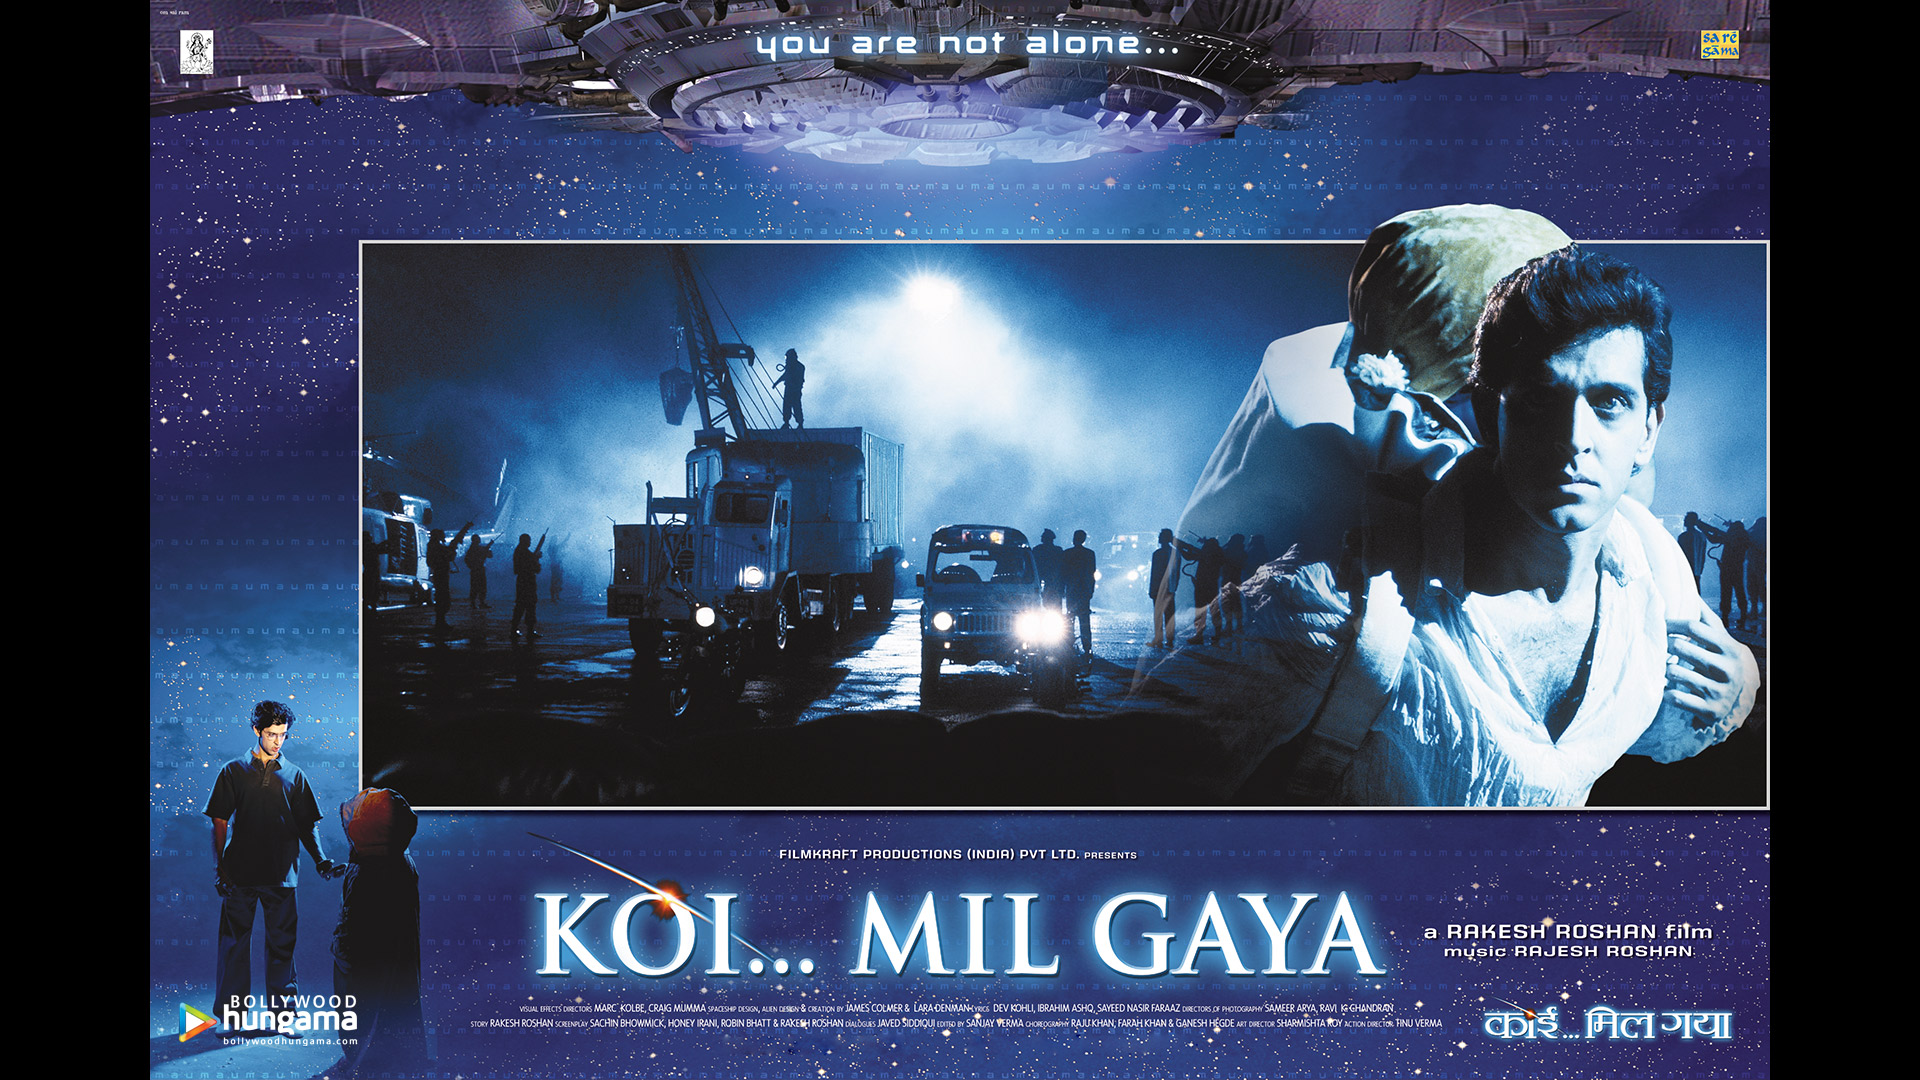 Koi mil gaya 2003 wallpapers koi mil gaya 12 bollywood for Koi mil gaya 2